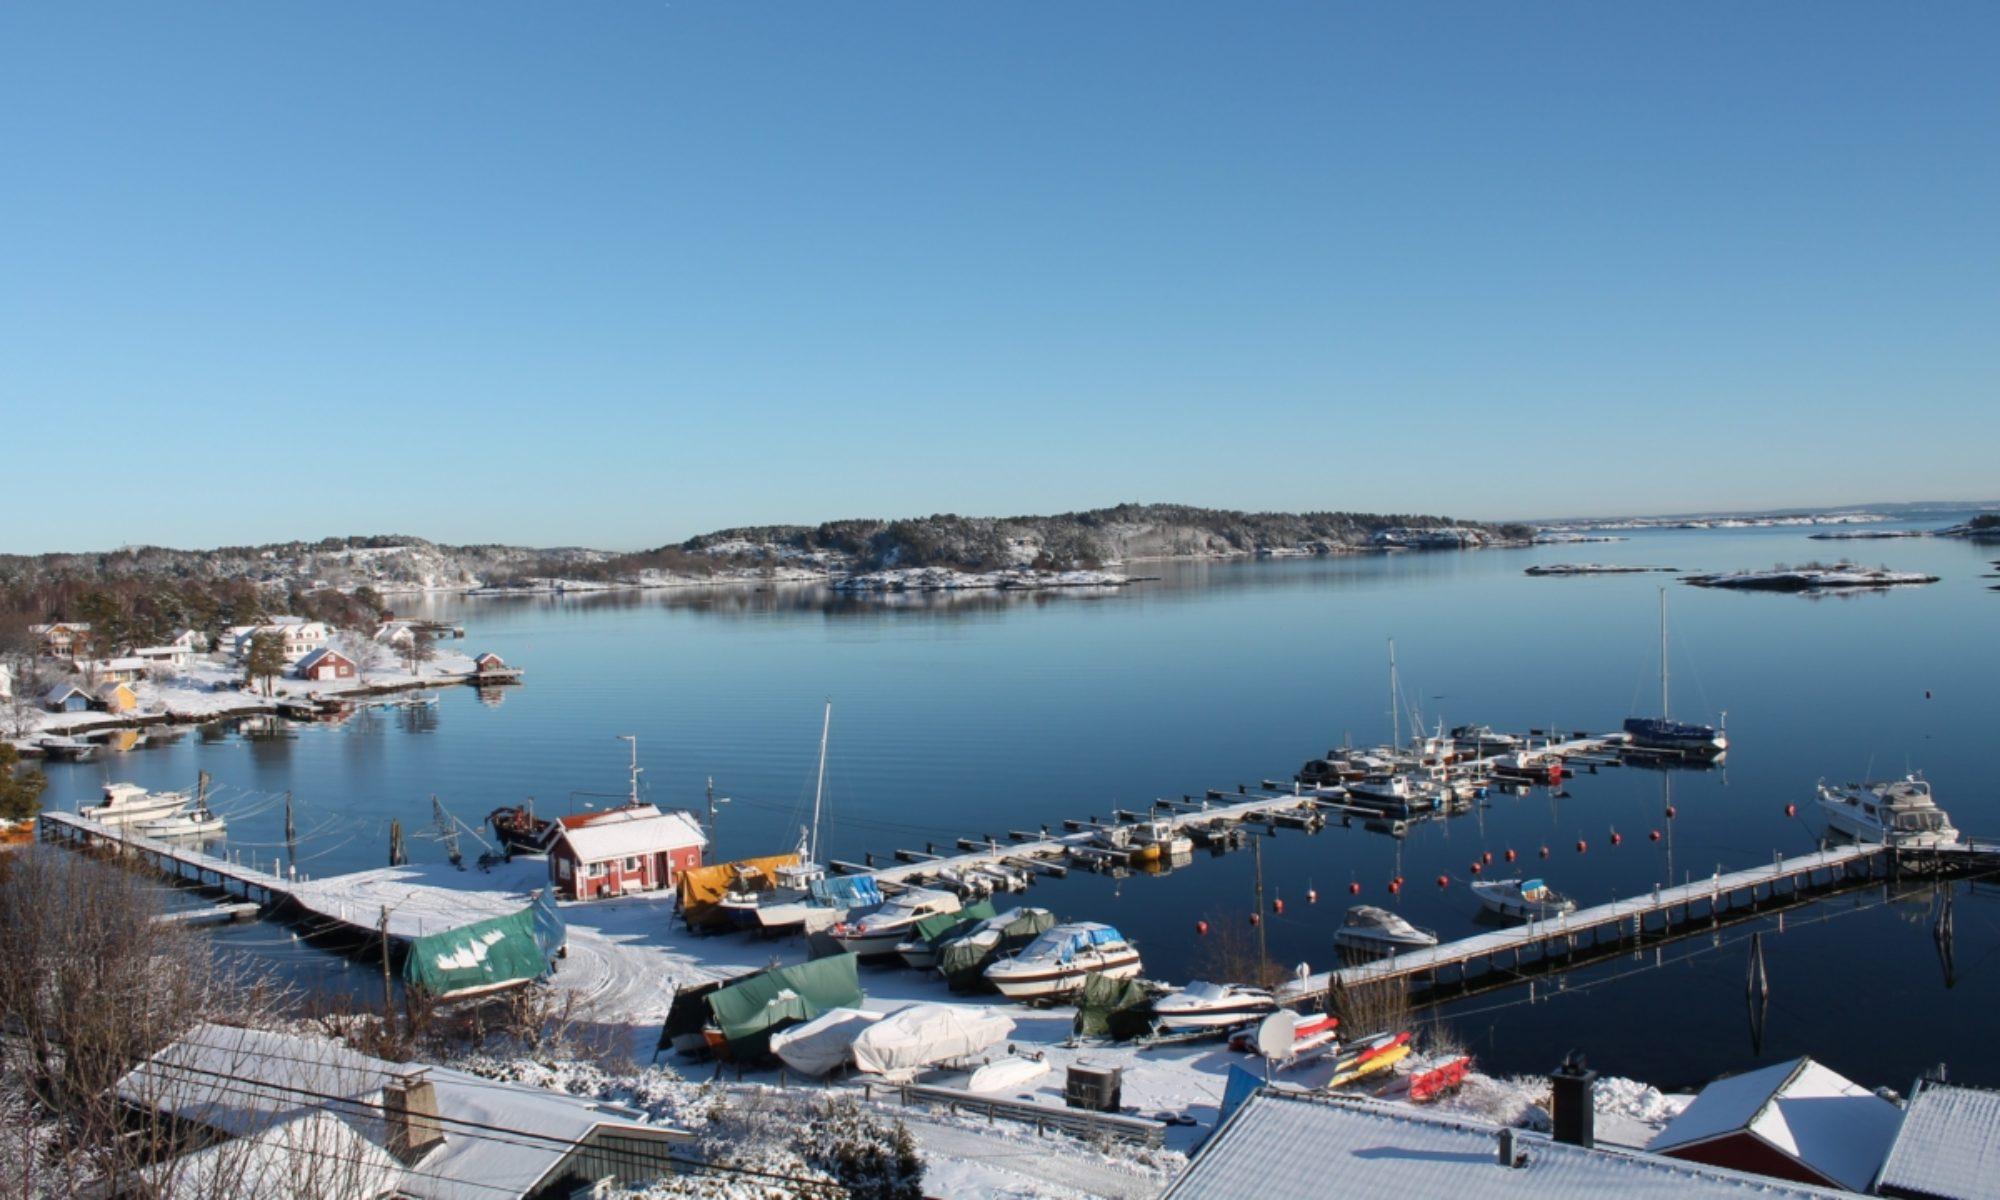 Grimestad Vel og Båtforening